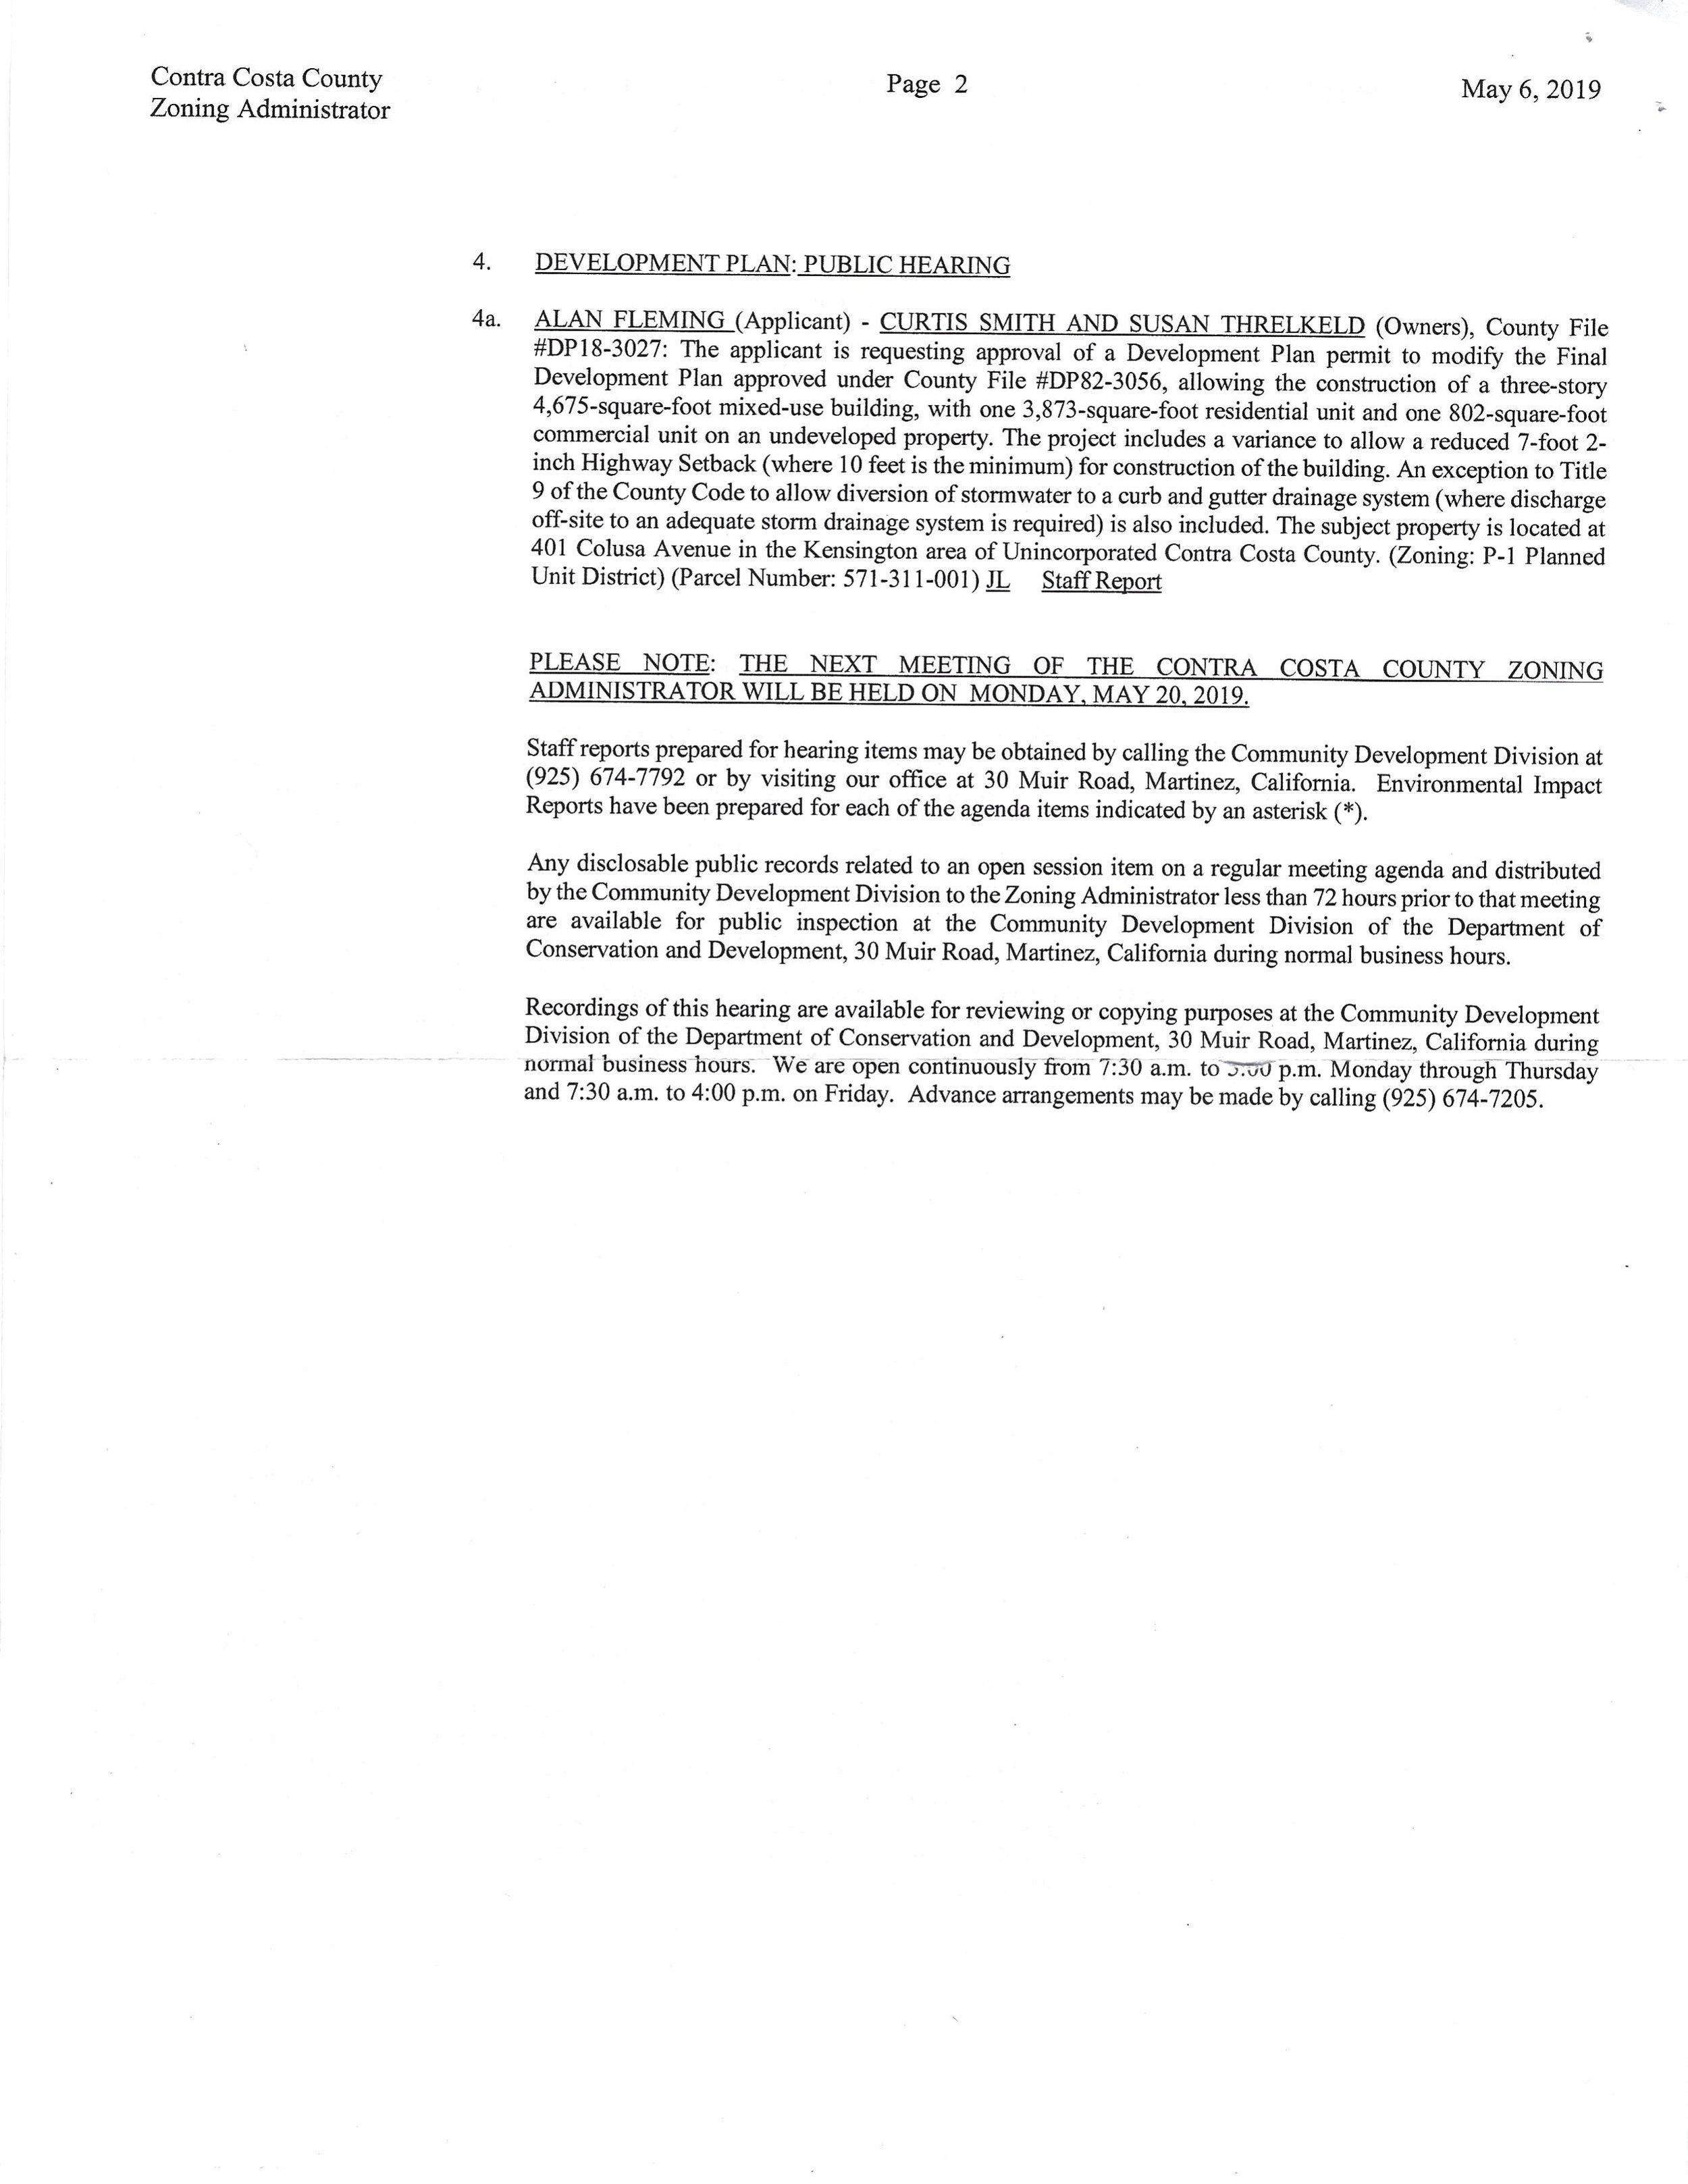 ESMAC Agenda 5.8.2019b_11.jpg